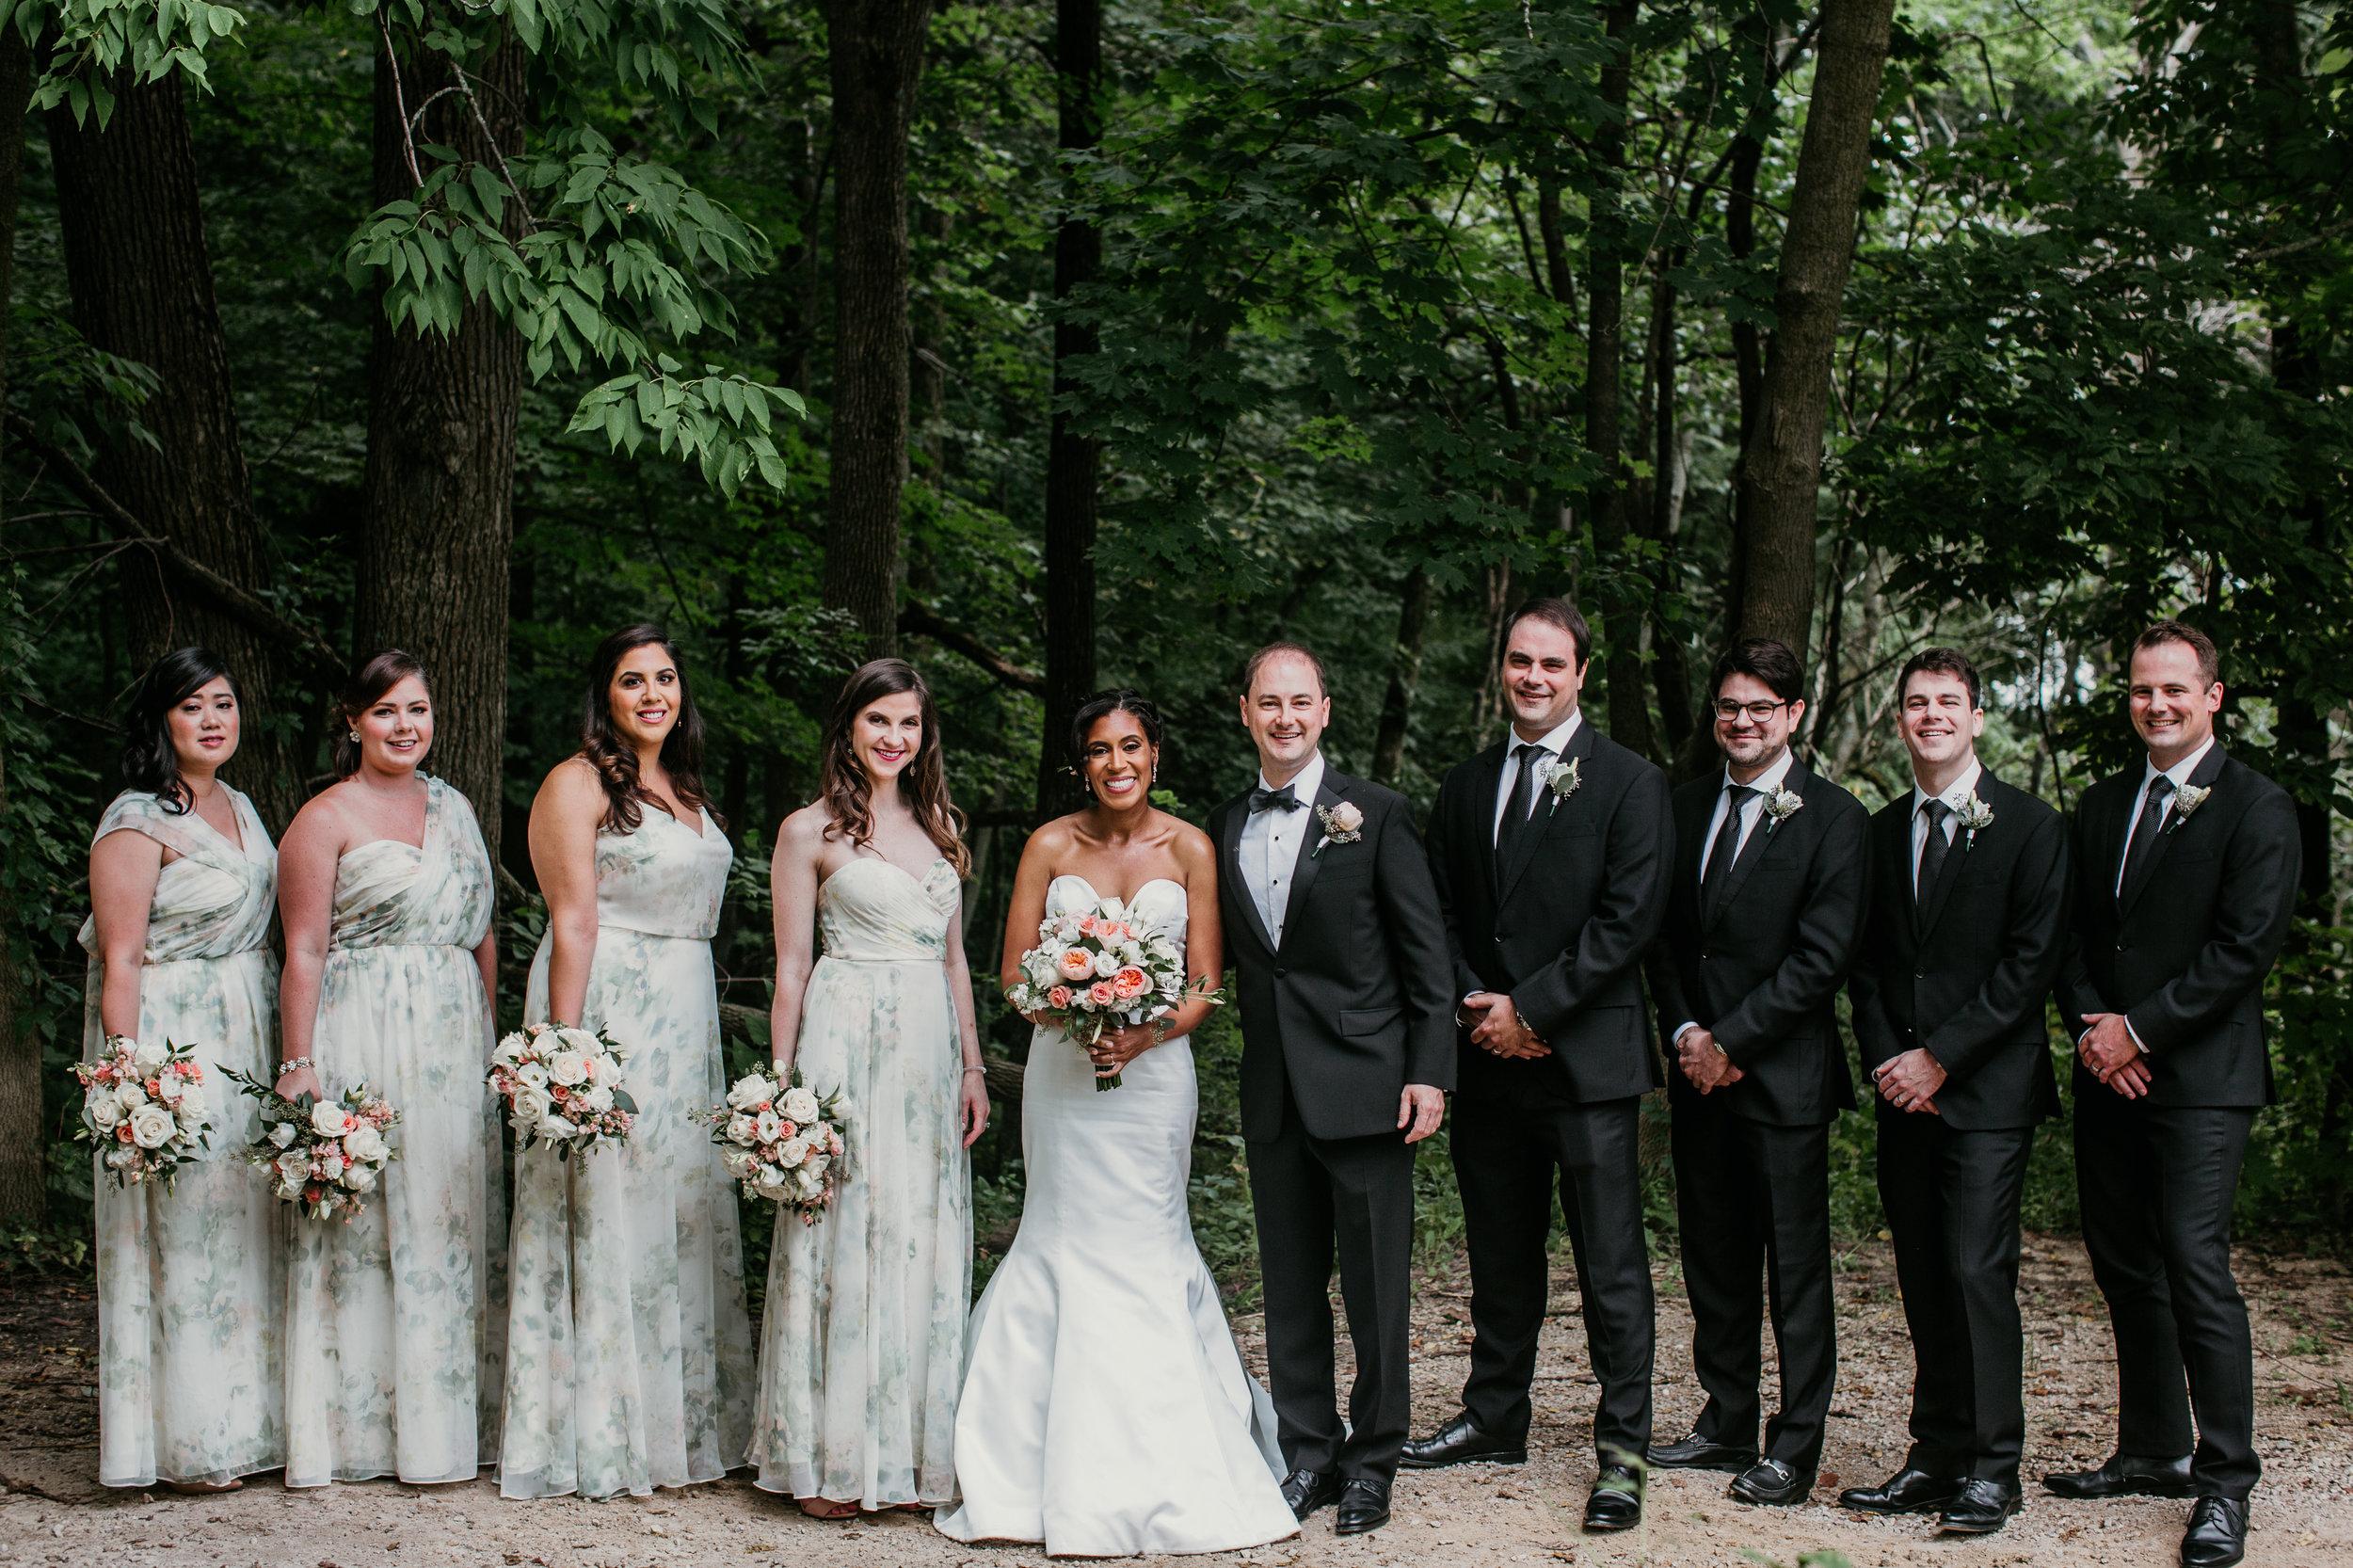 weddingparty-paperantler-0010.jpg